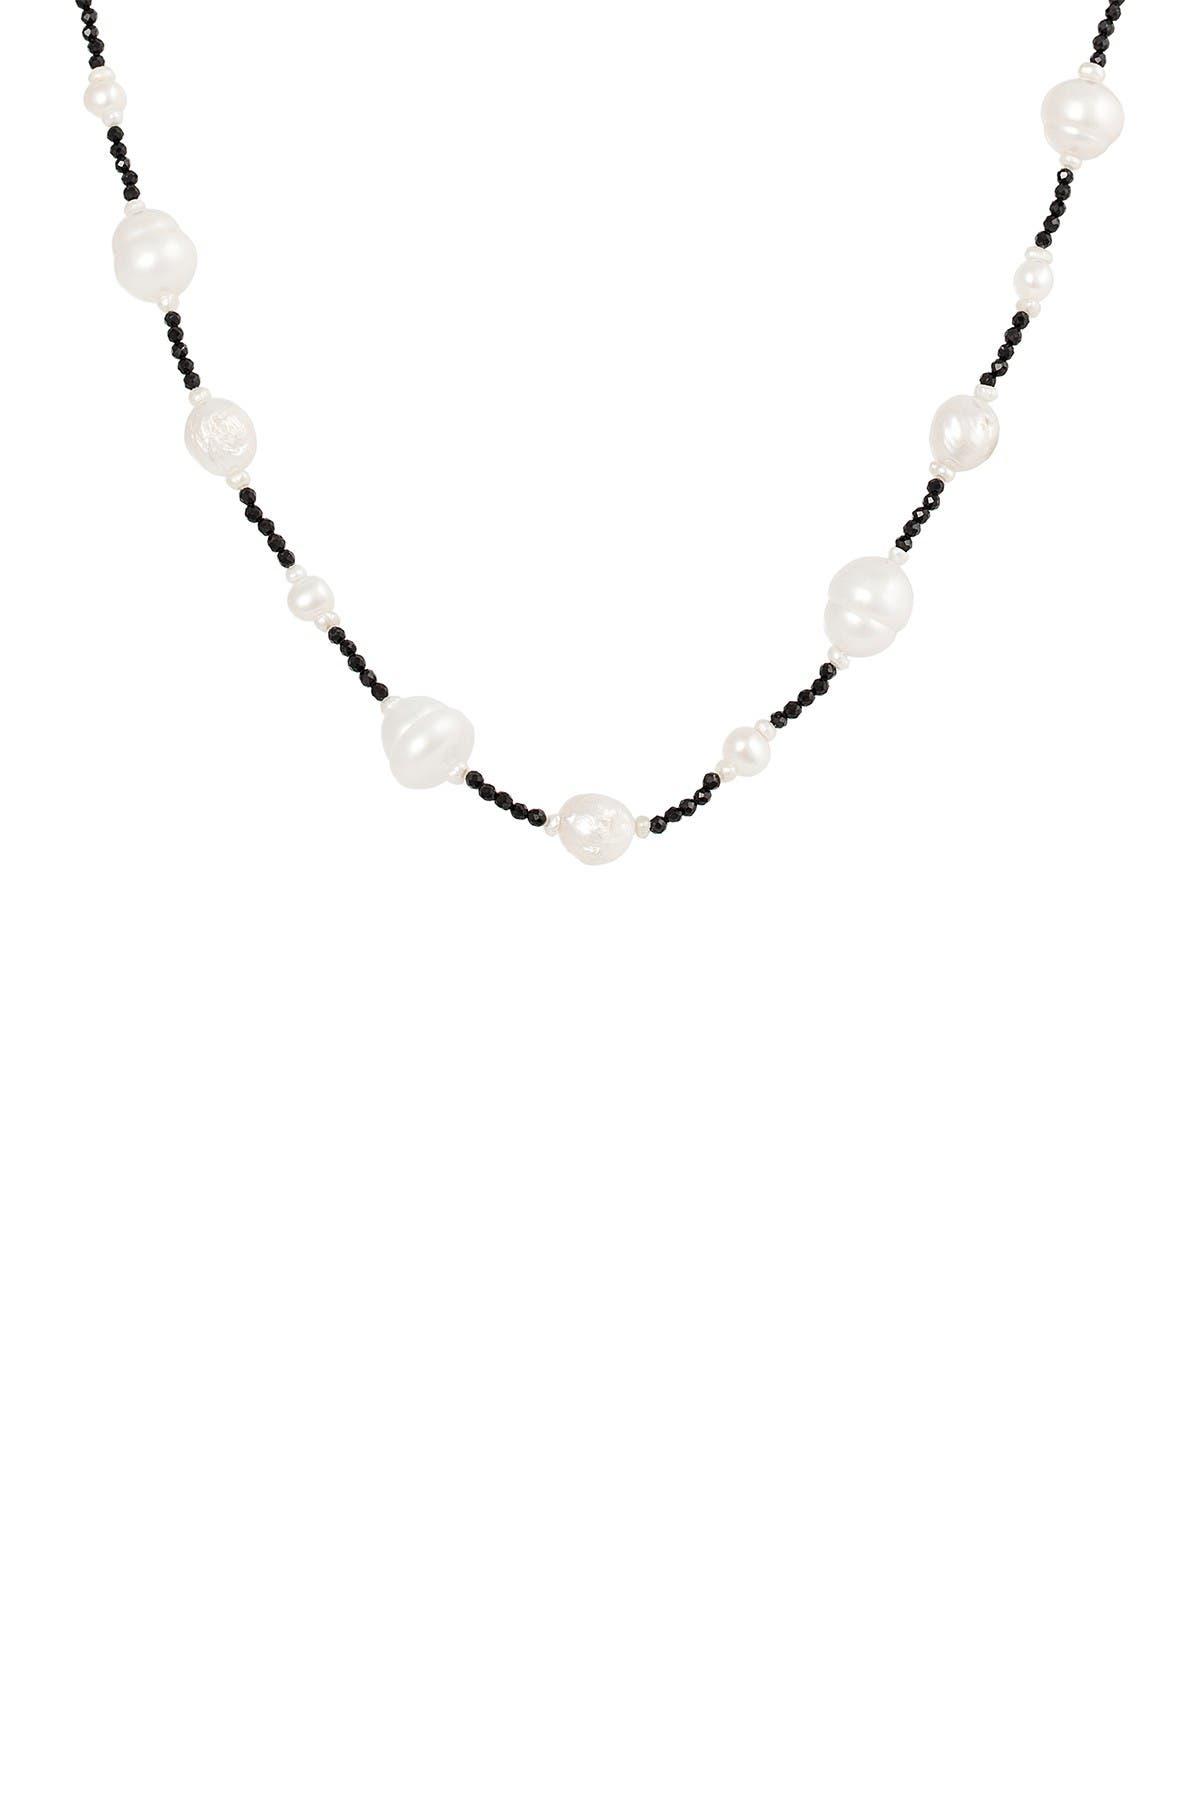 Splendid Pearls 10-11mm Freshwater Pearl Necklace at Nordstrom Rack